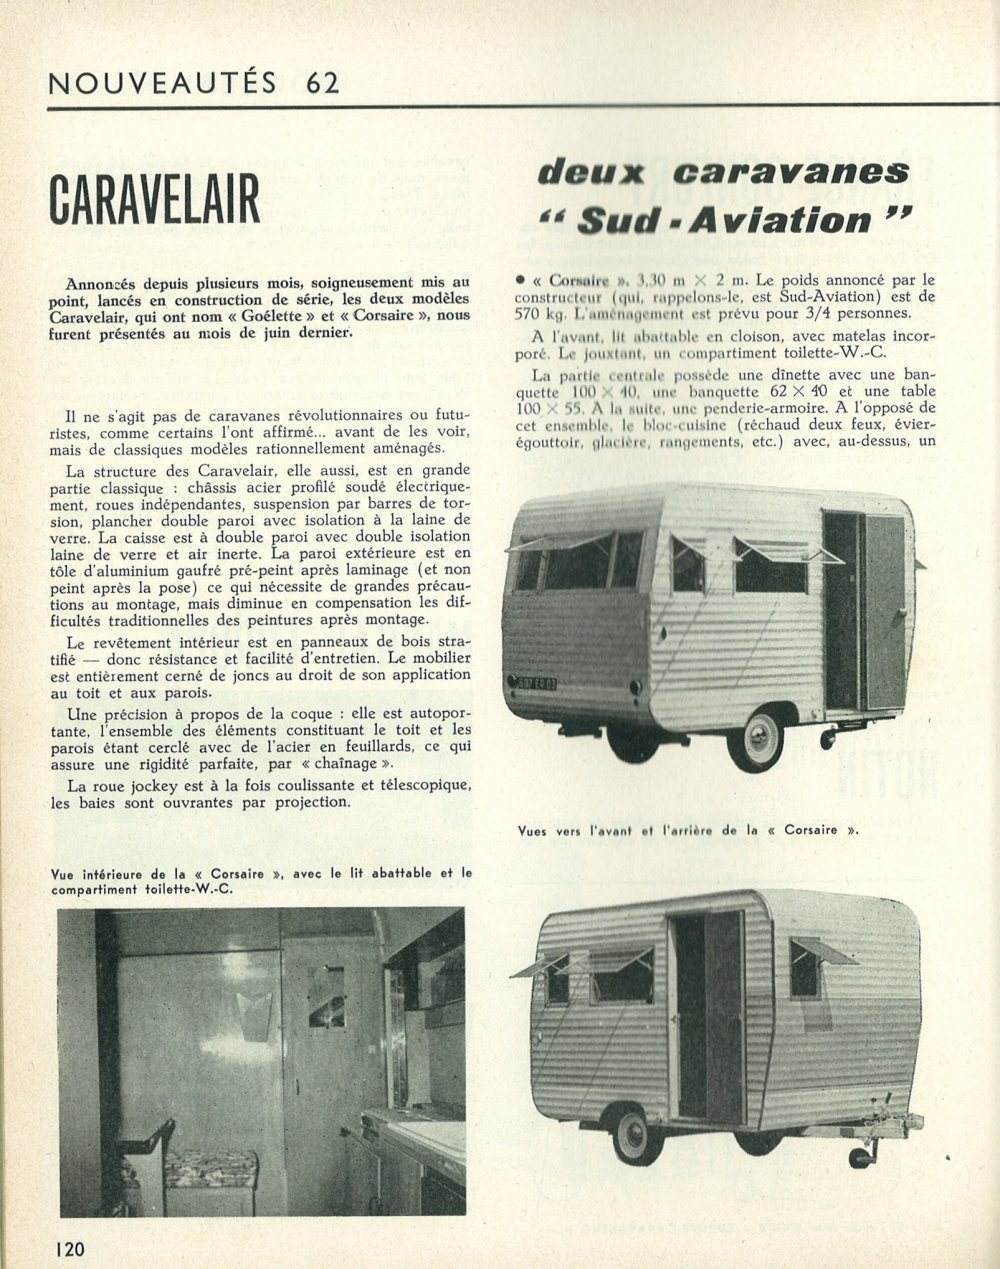 1418833778_caravelair_62.jpg